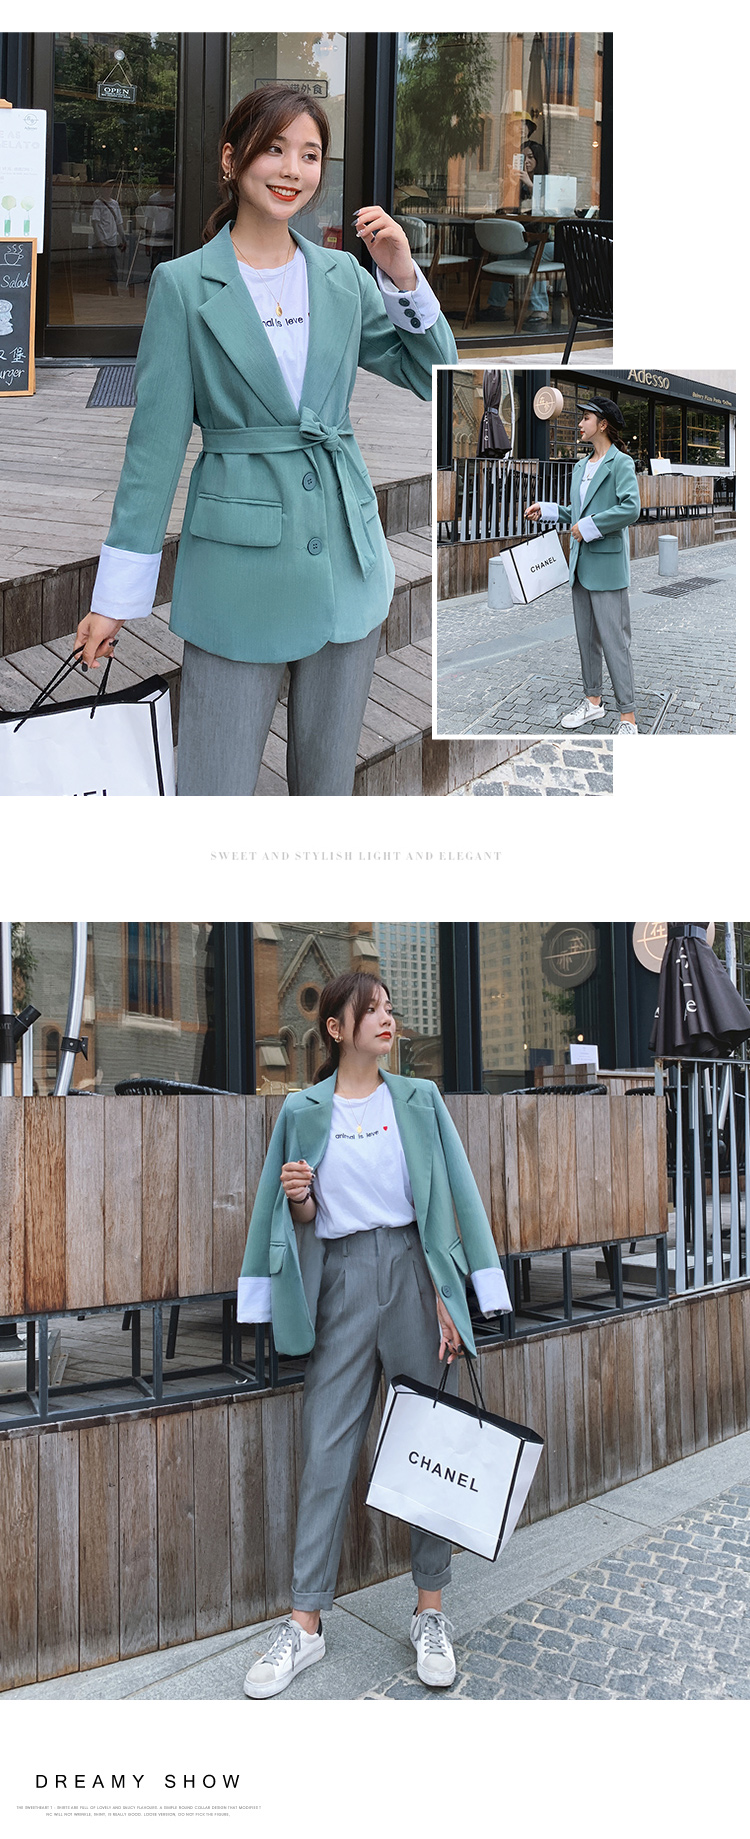 YK8耀客秋装外套系列 新款俏皮韩版宽松西装外套 青绿色 款号:qy-0300